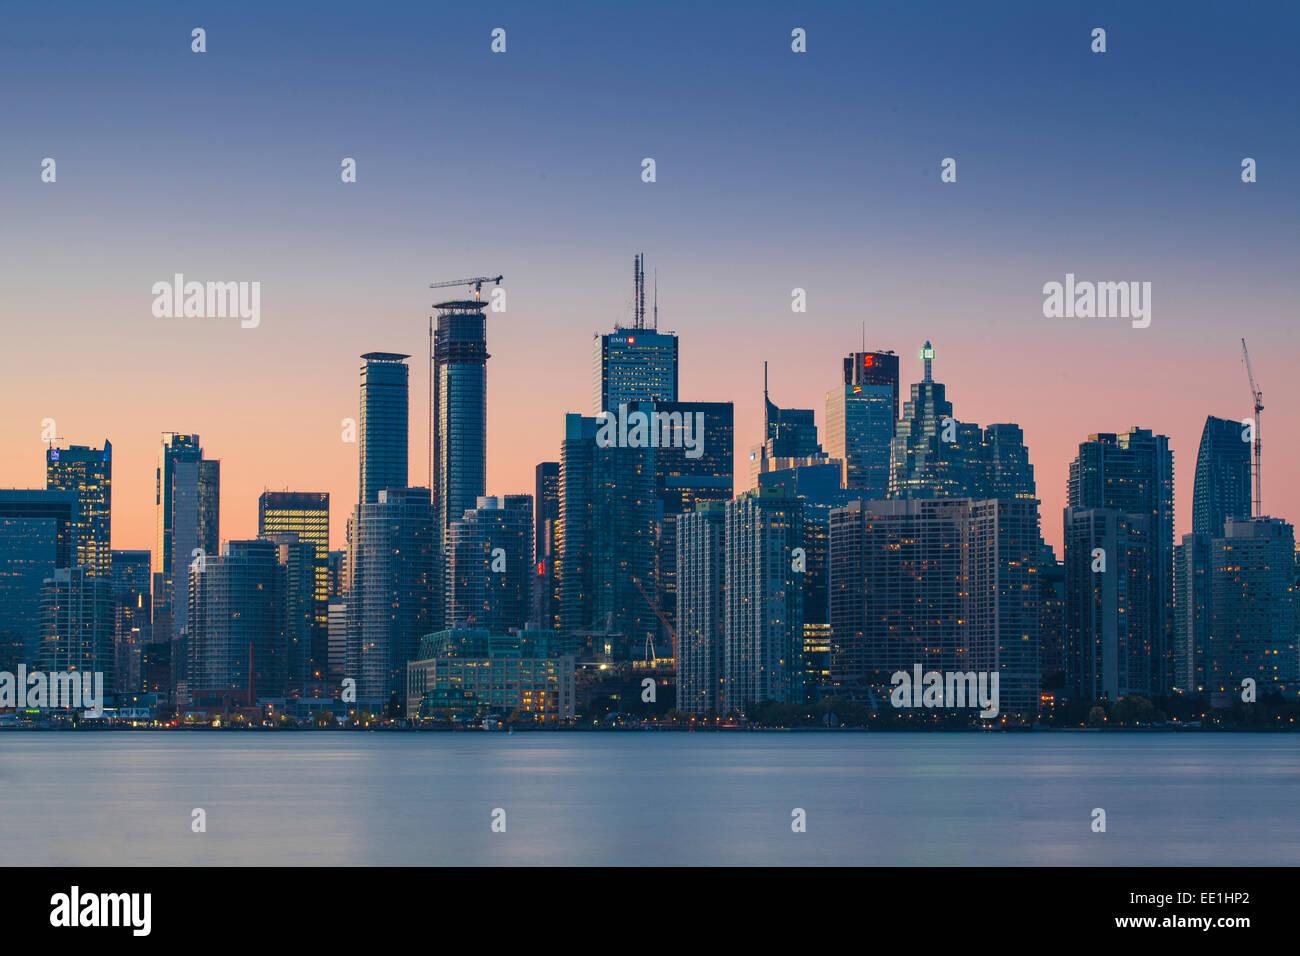 View of city skyline, Toronto, Ontario, Canada, North America - Stock Image